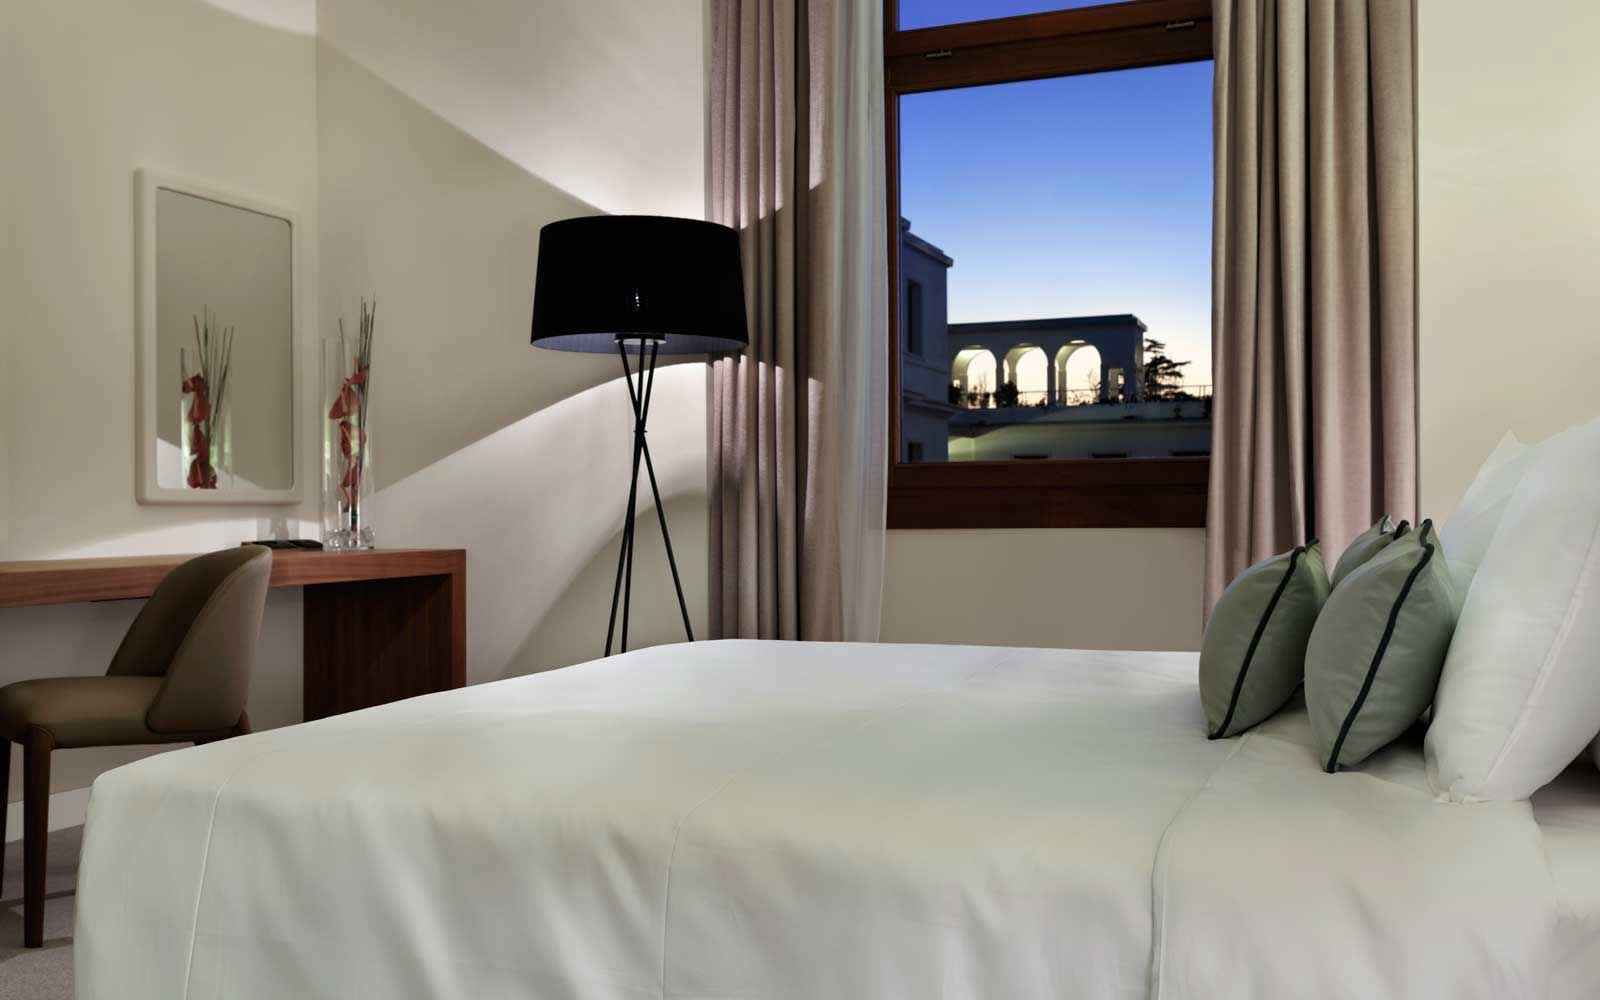 Deluxe Room at the JW Marriott Venice Resort & Spa